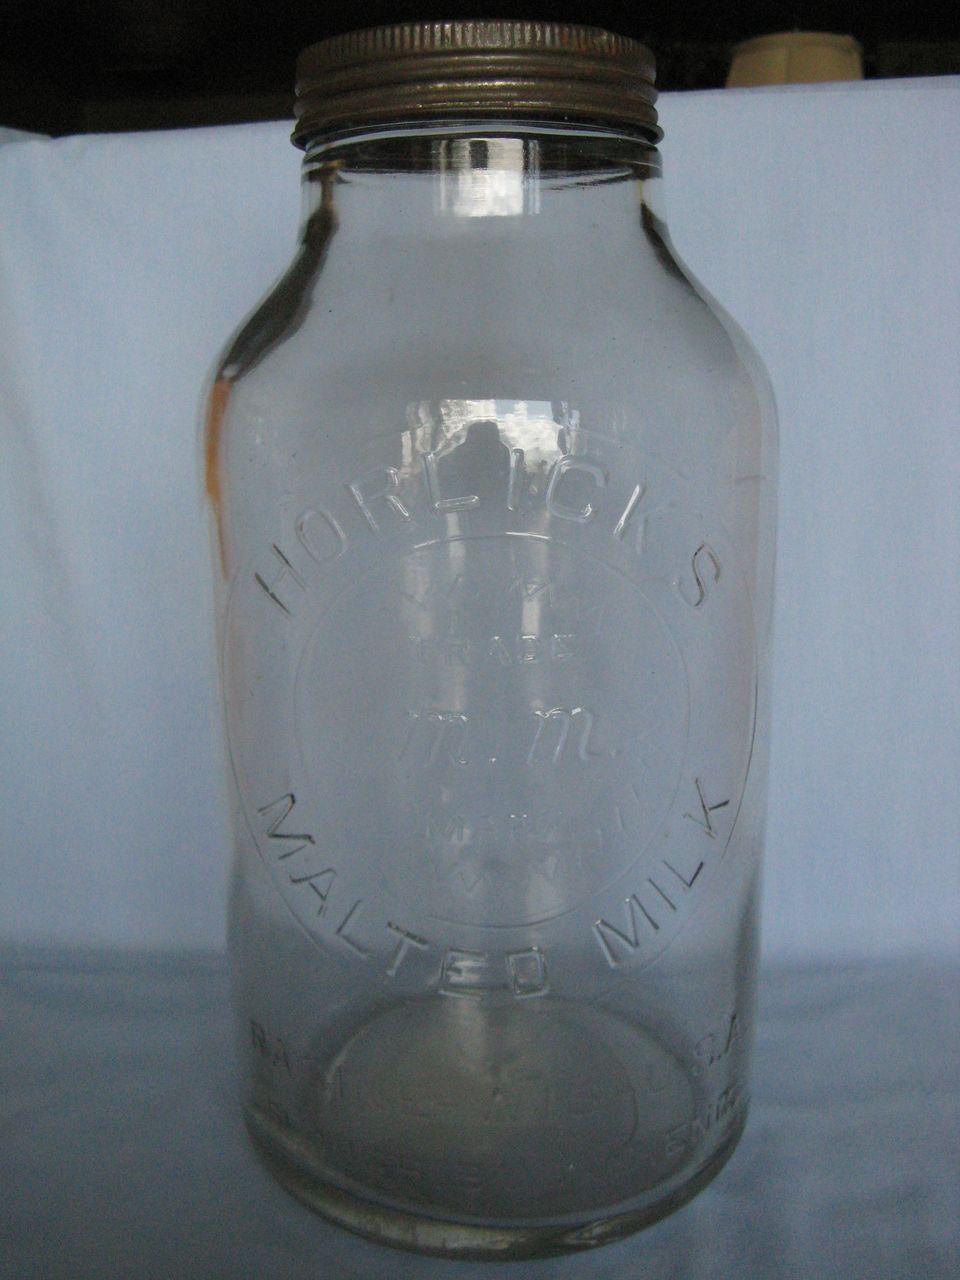 Horlick's Malted Milk Vintage Jar